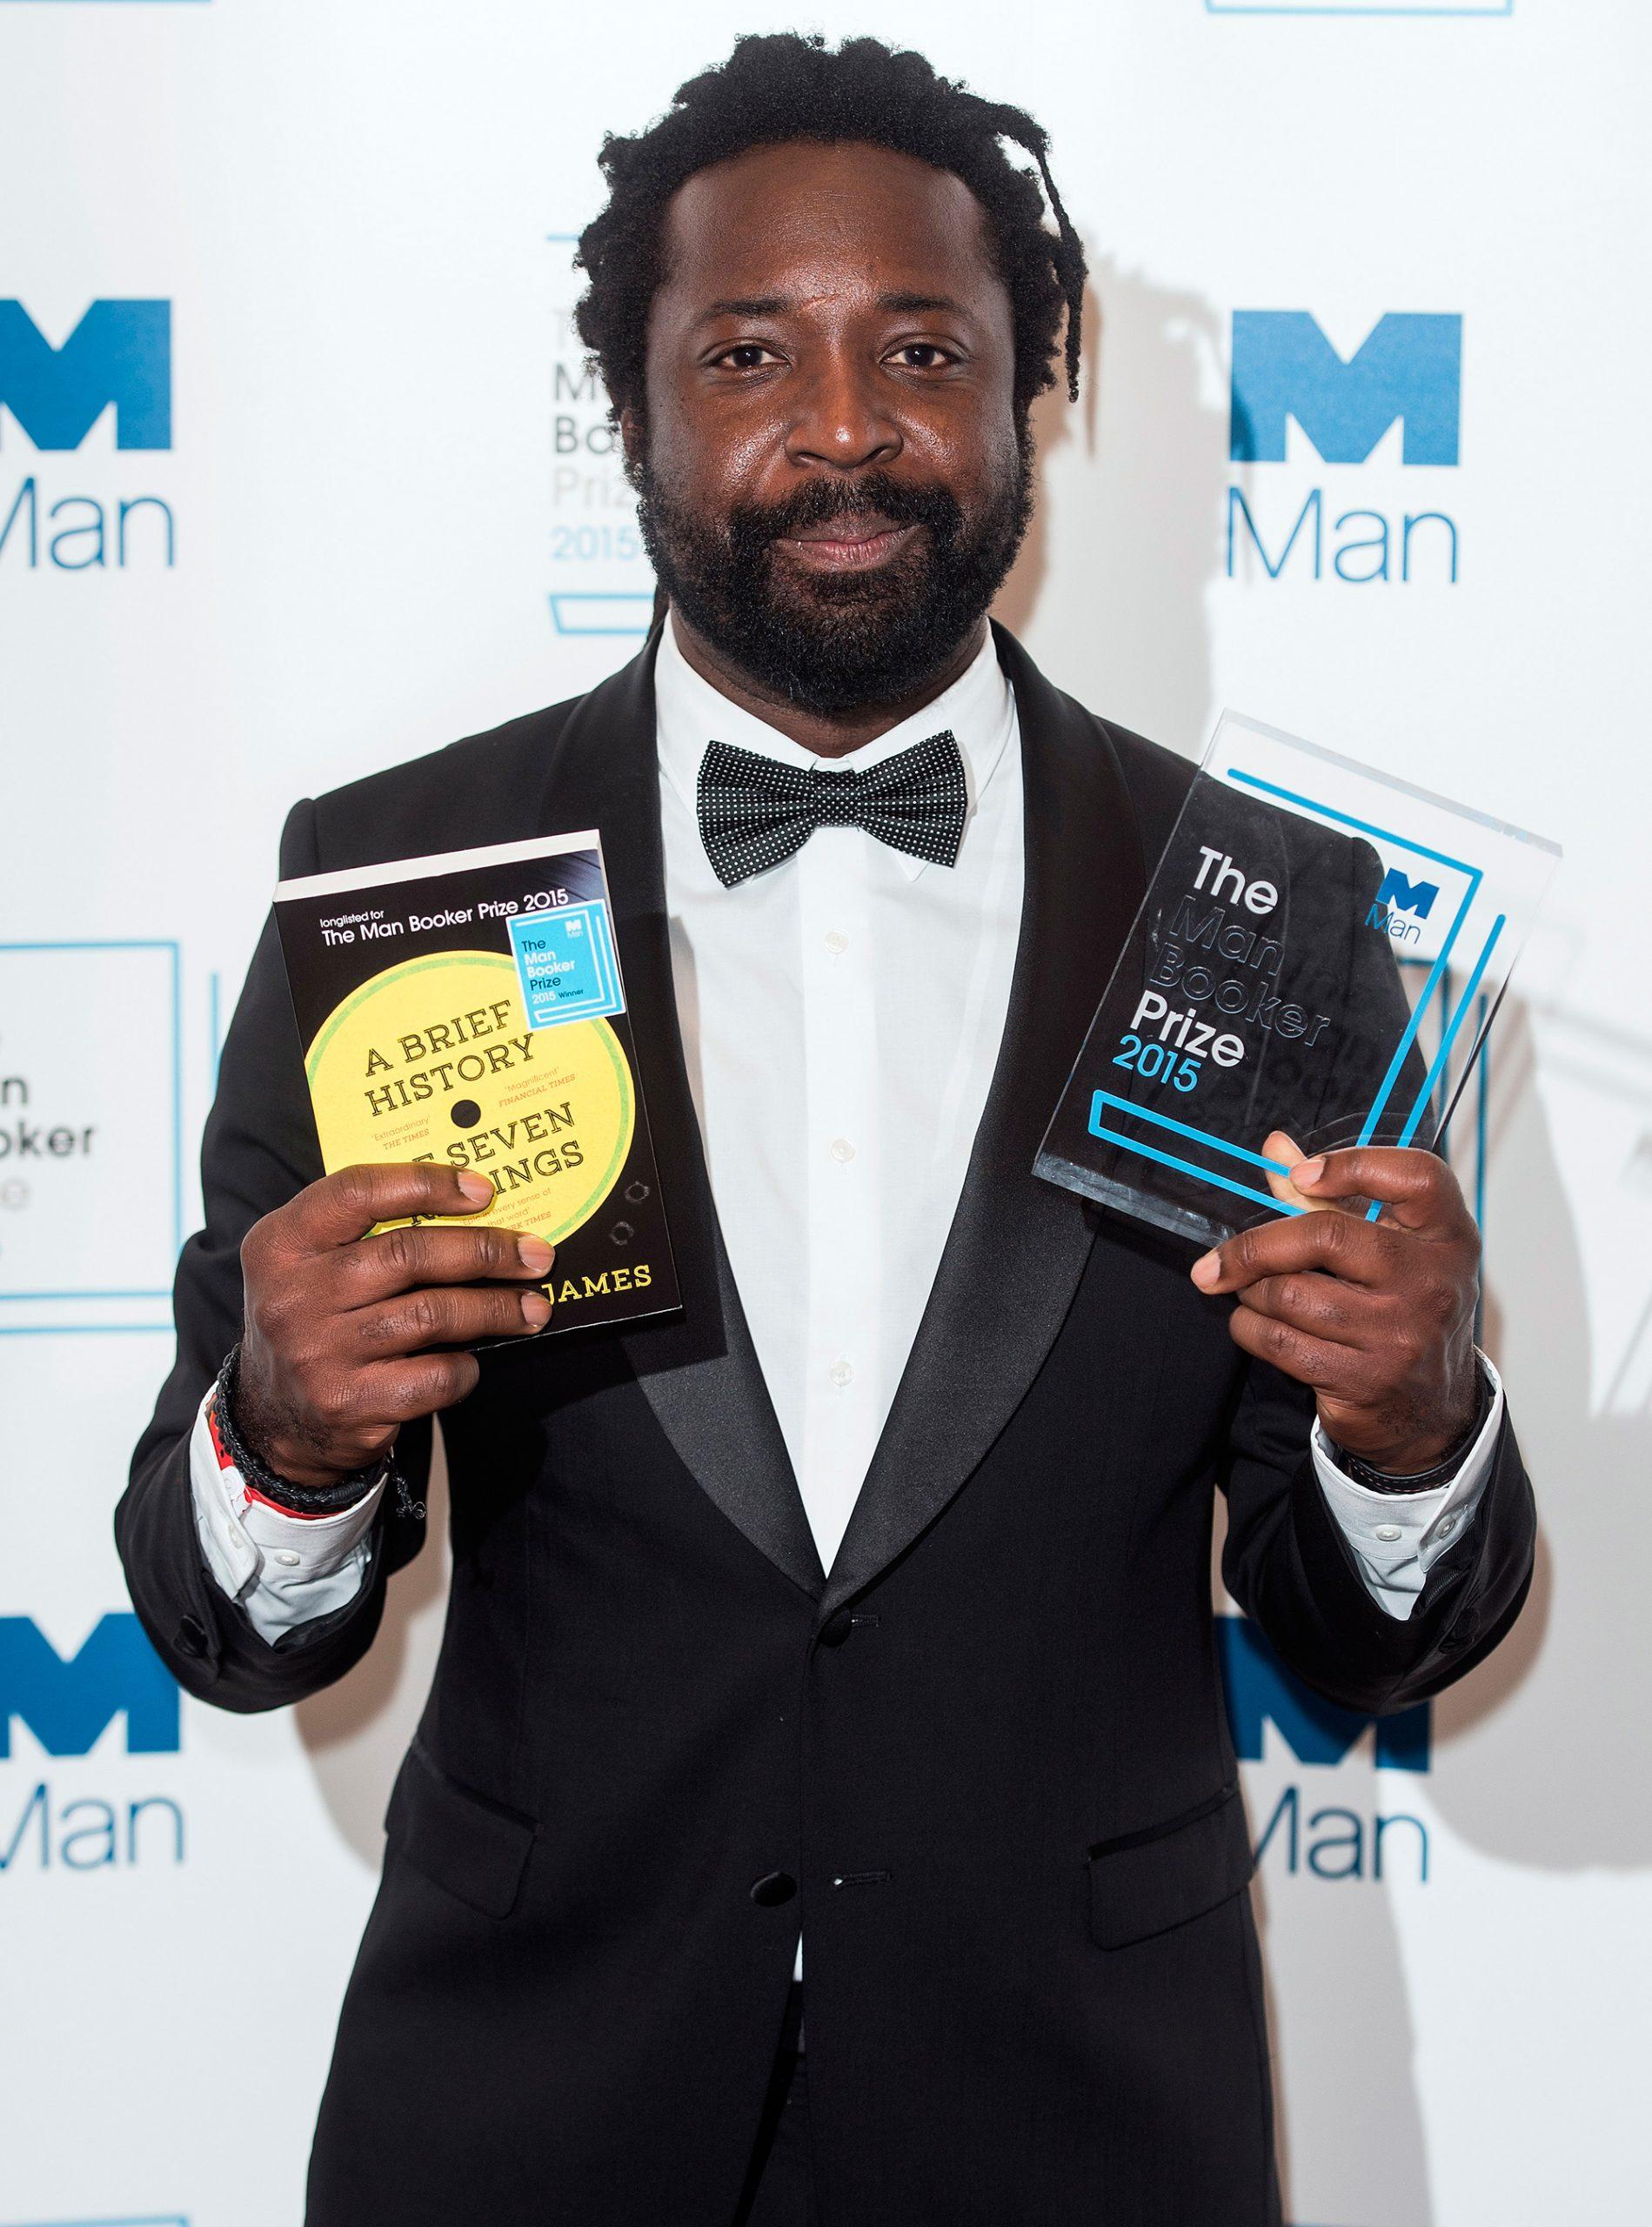 Man-Booker-prize-winner.jpg